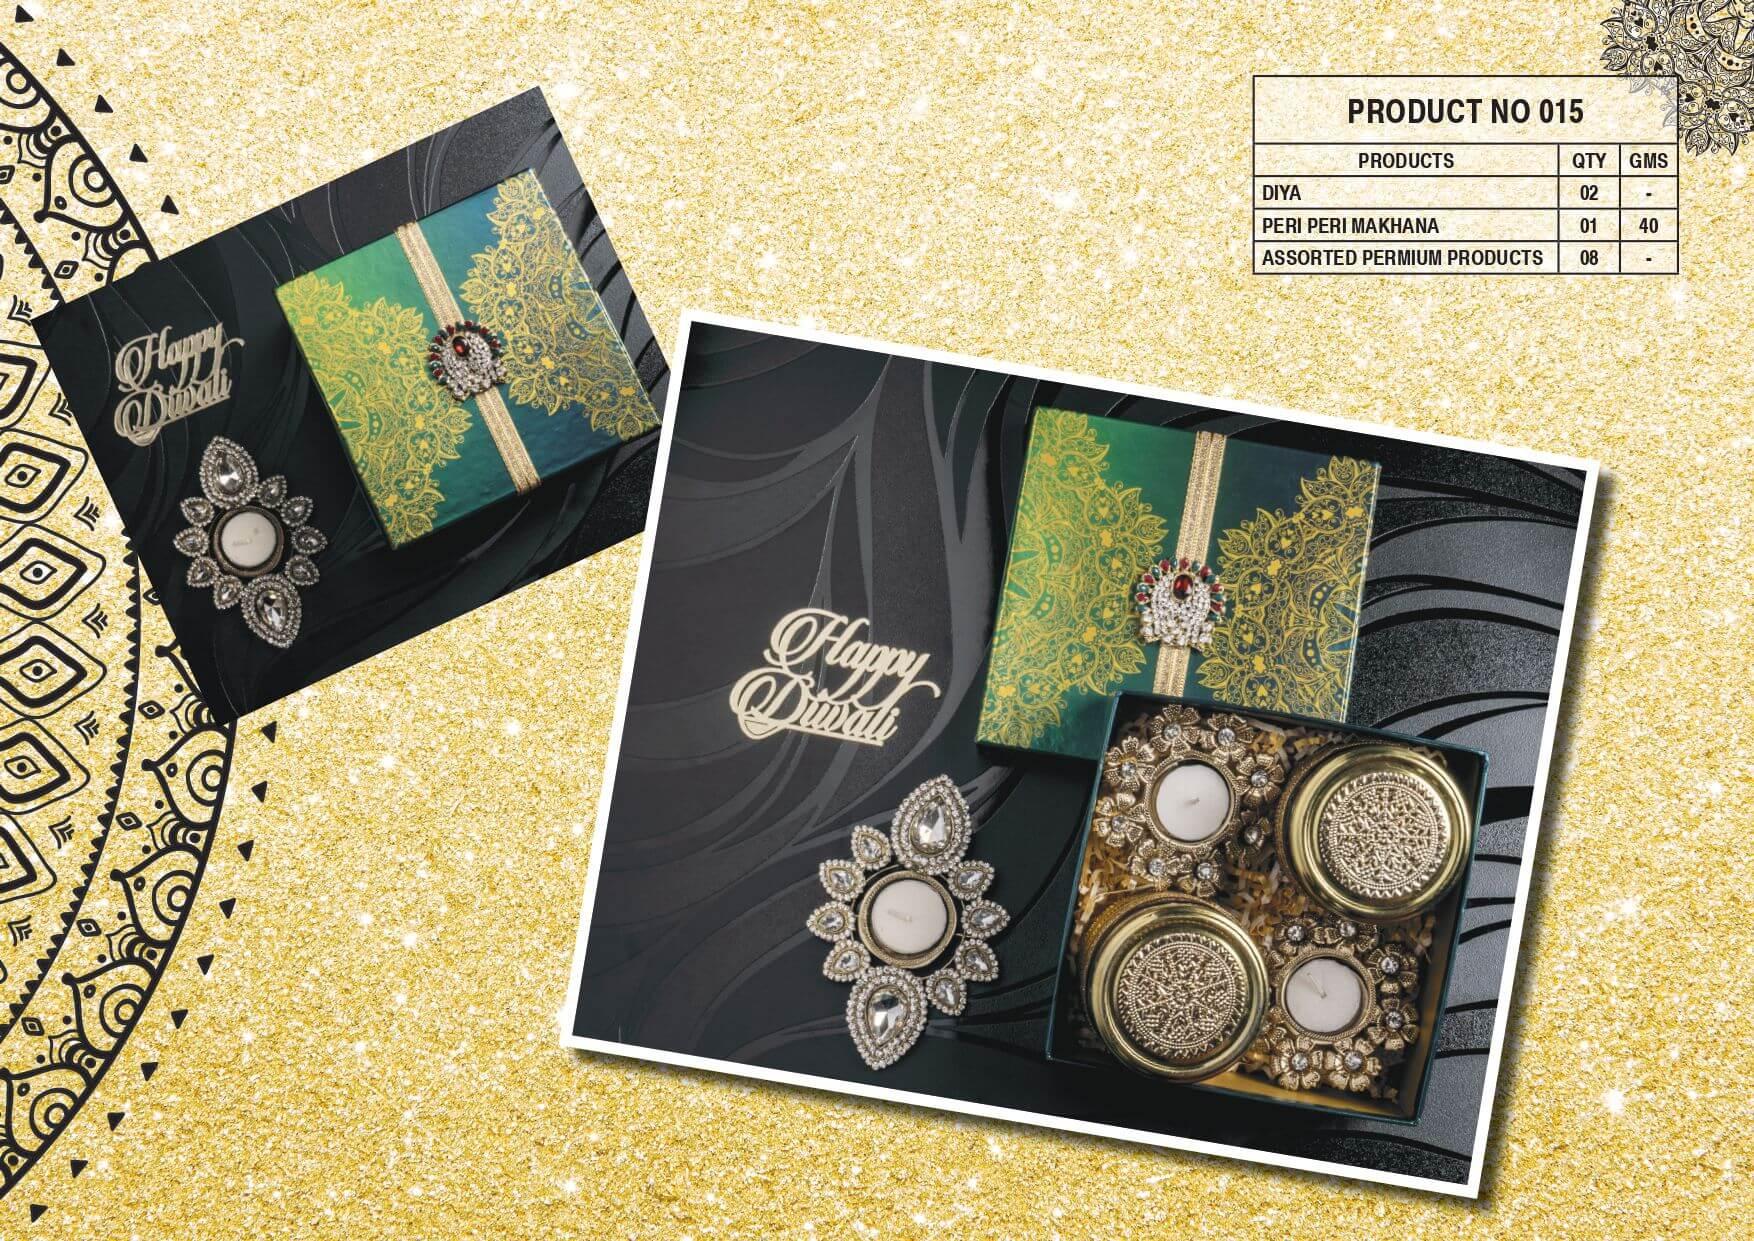 Diwali Gifts India PRODUCT NO 015